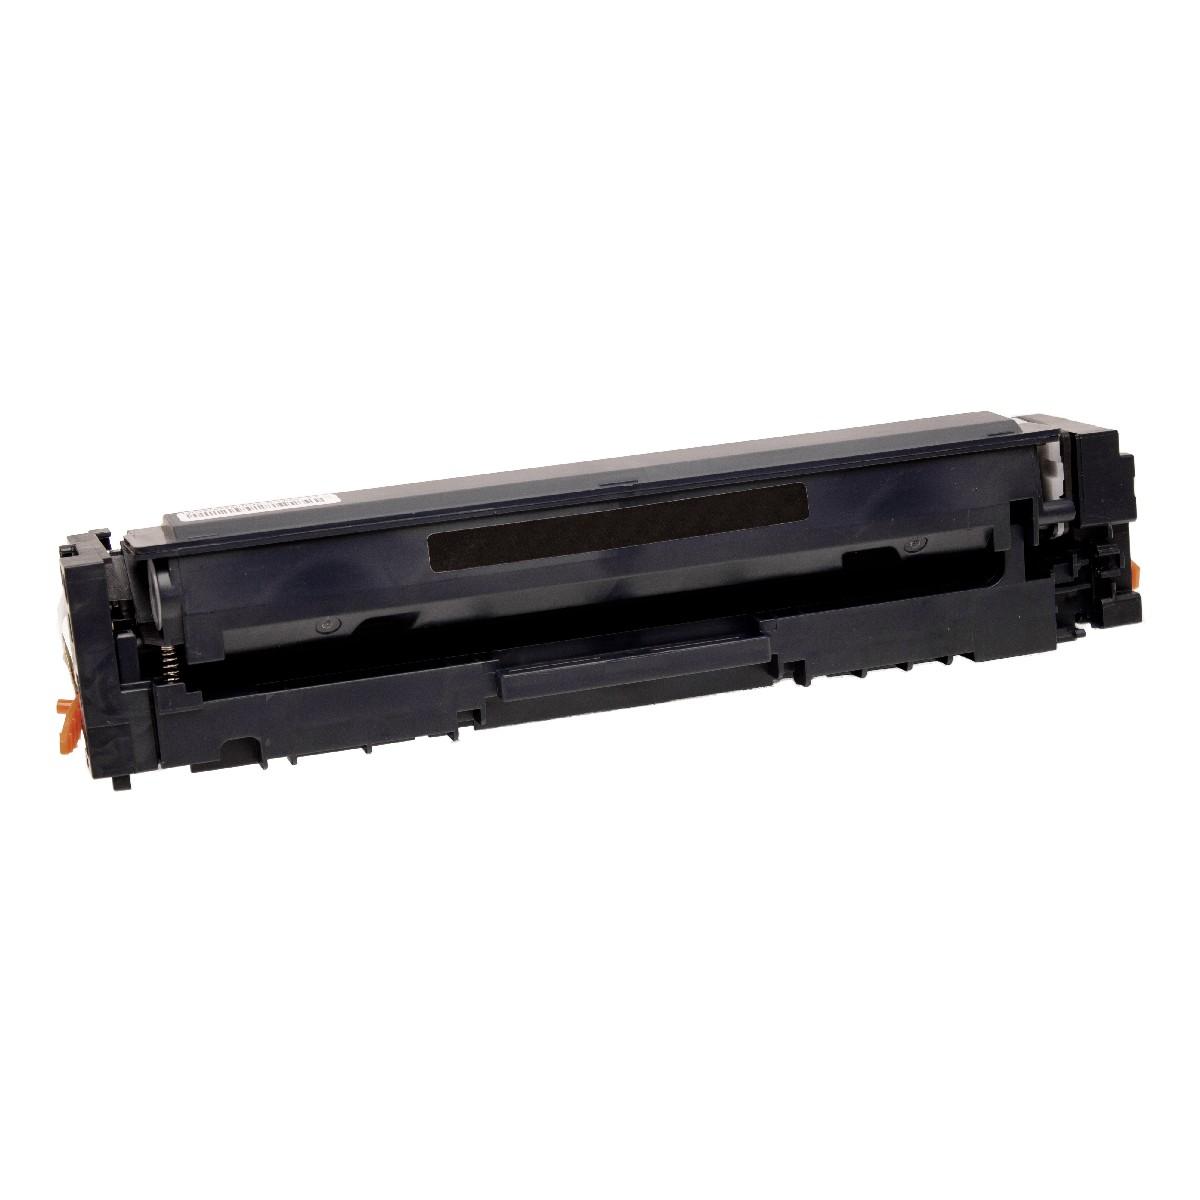 Toner HP Συμβατό 415X (W2030X) BK ΧΩΡΙΣ CHIP Σελίδες:7500 Black για Color LaserJet Enterprise, Color LaserJet Enterprise MFP